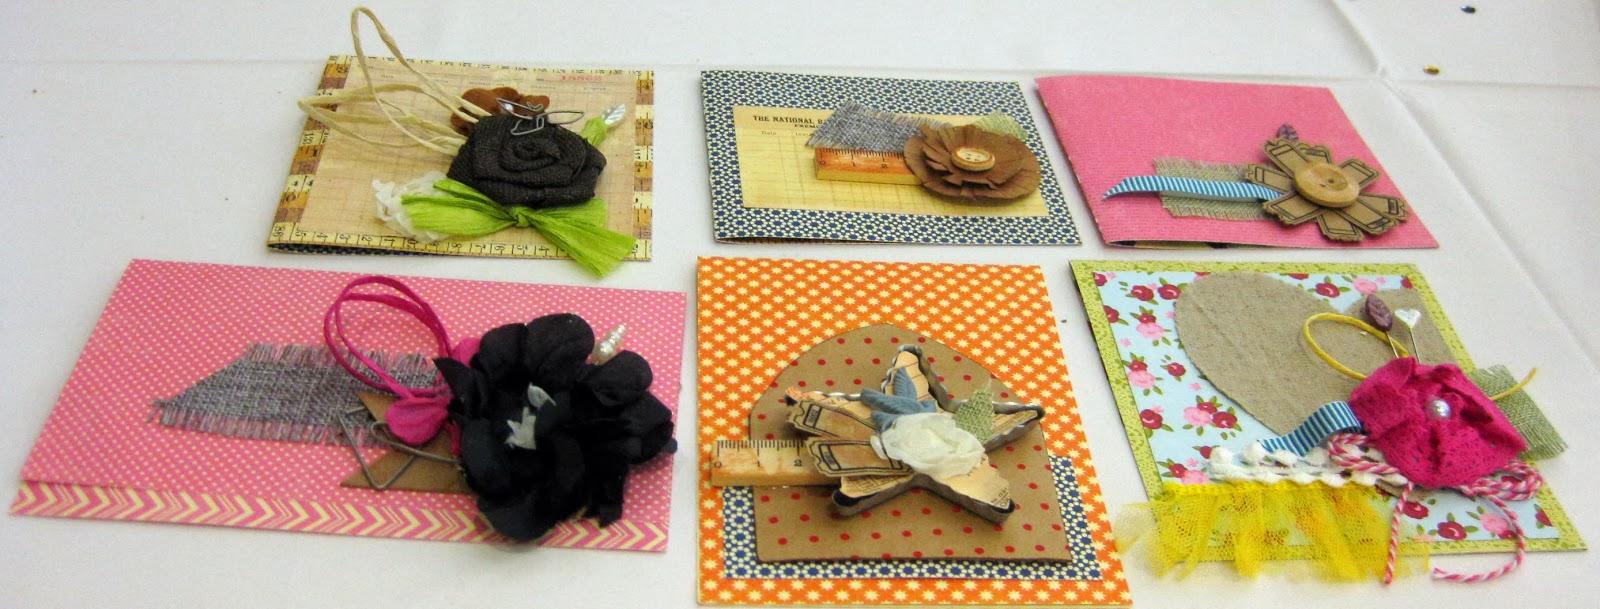 Maya Road workshop completed cards